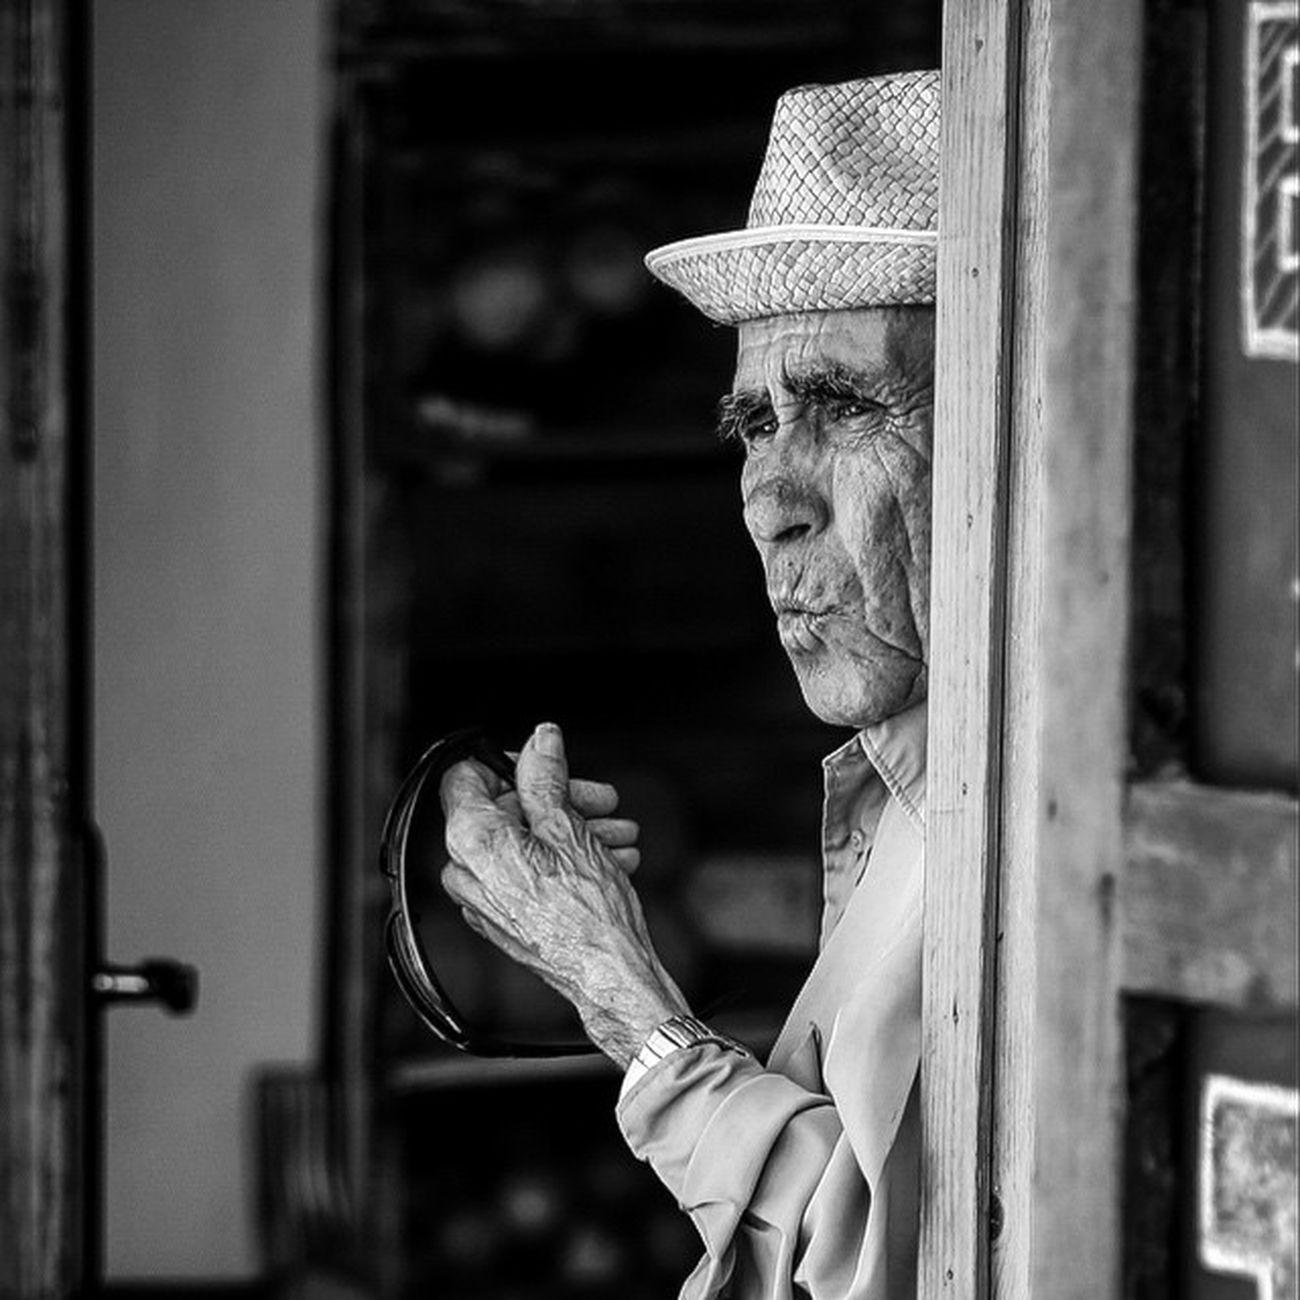 years of wisdom Wisdom Blackandwhitephotography Blackandwhite Monochrome White Black Ibiza Oldman Old Amazing Instagood Instadaily Instamood Instabeauty Escalinata Portrait Look Man Eyes TPSextreme @thephotosociety